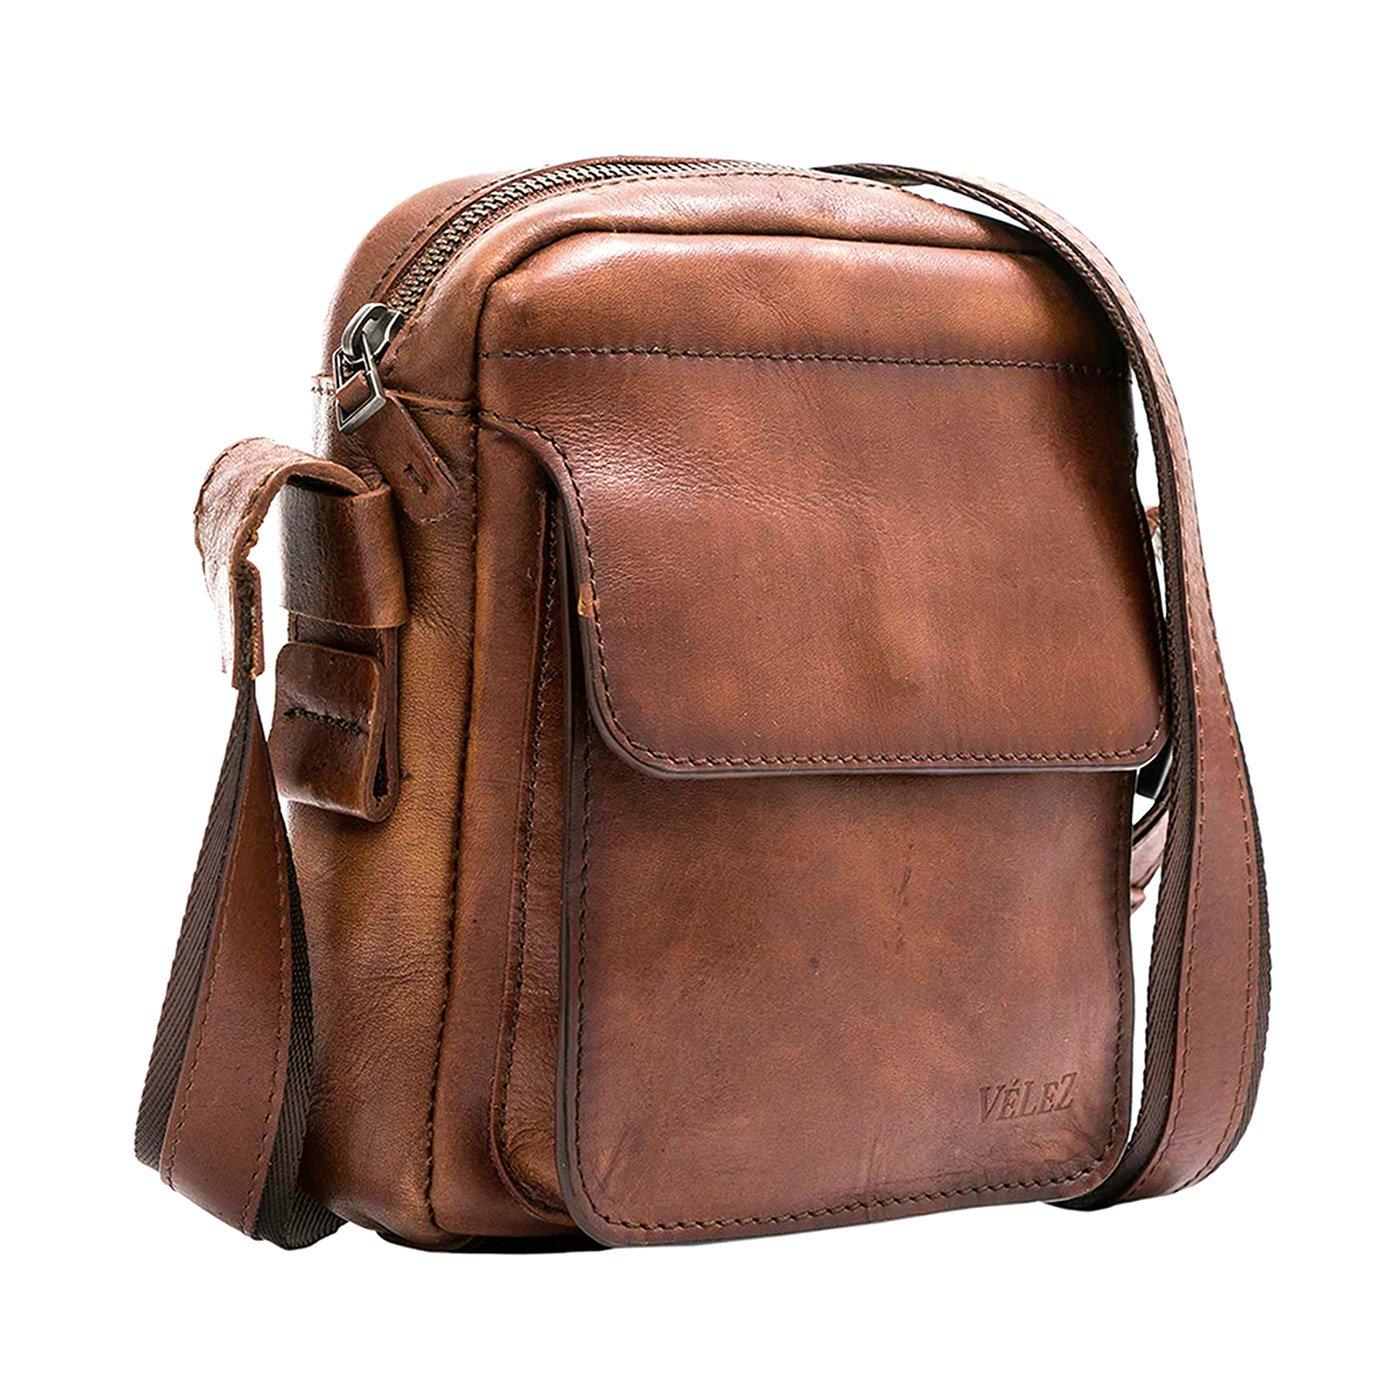 Amazon.com | VÉLEZ 20136 Men Genuine Leather Crossbody Bag | Bandolera De Cuero Black | Backpacks